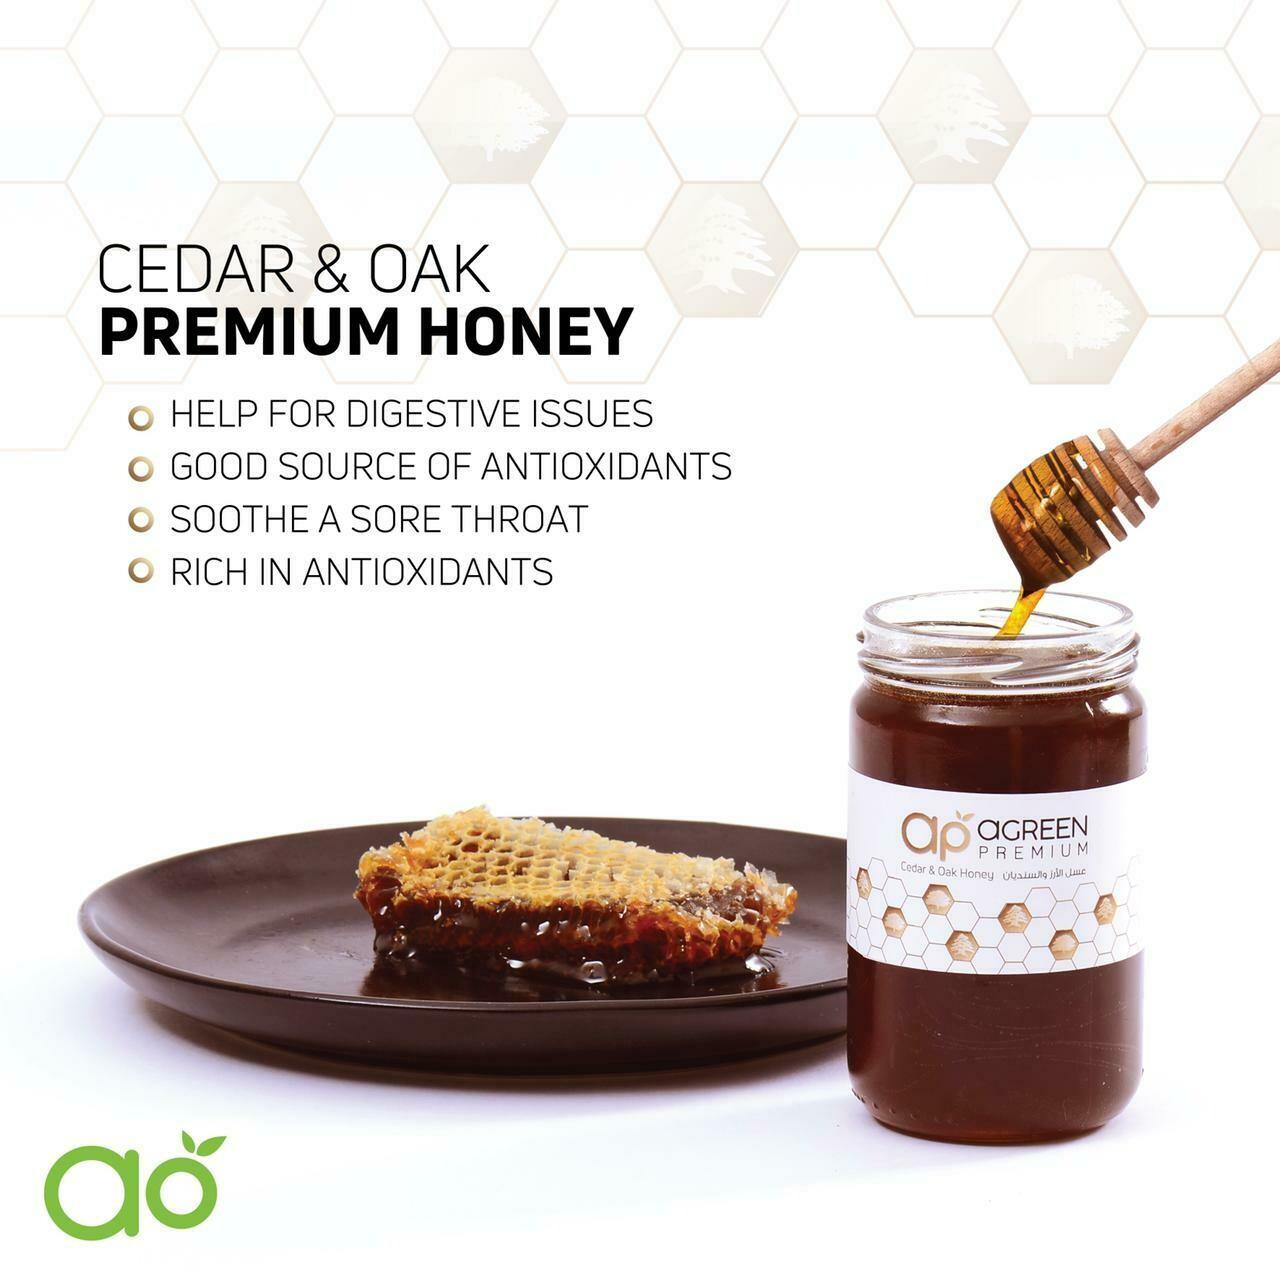 Honey Cedars and Oak Premium (Bag) - Agreen Organics